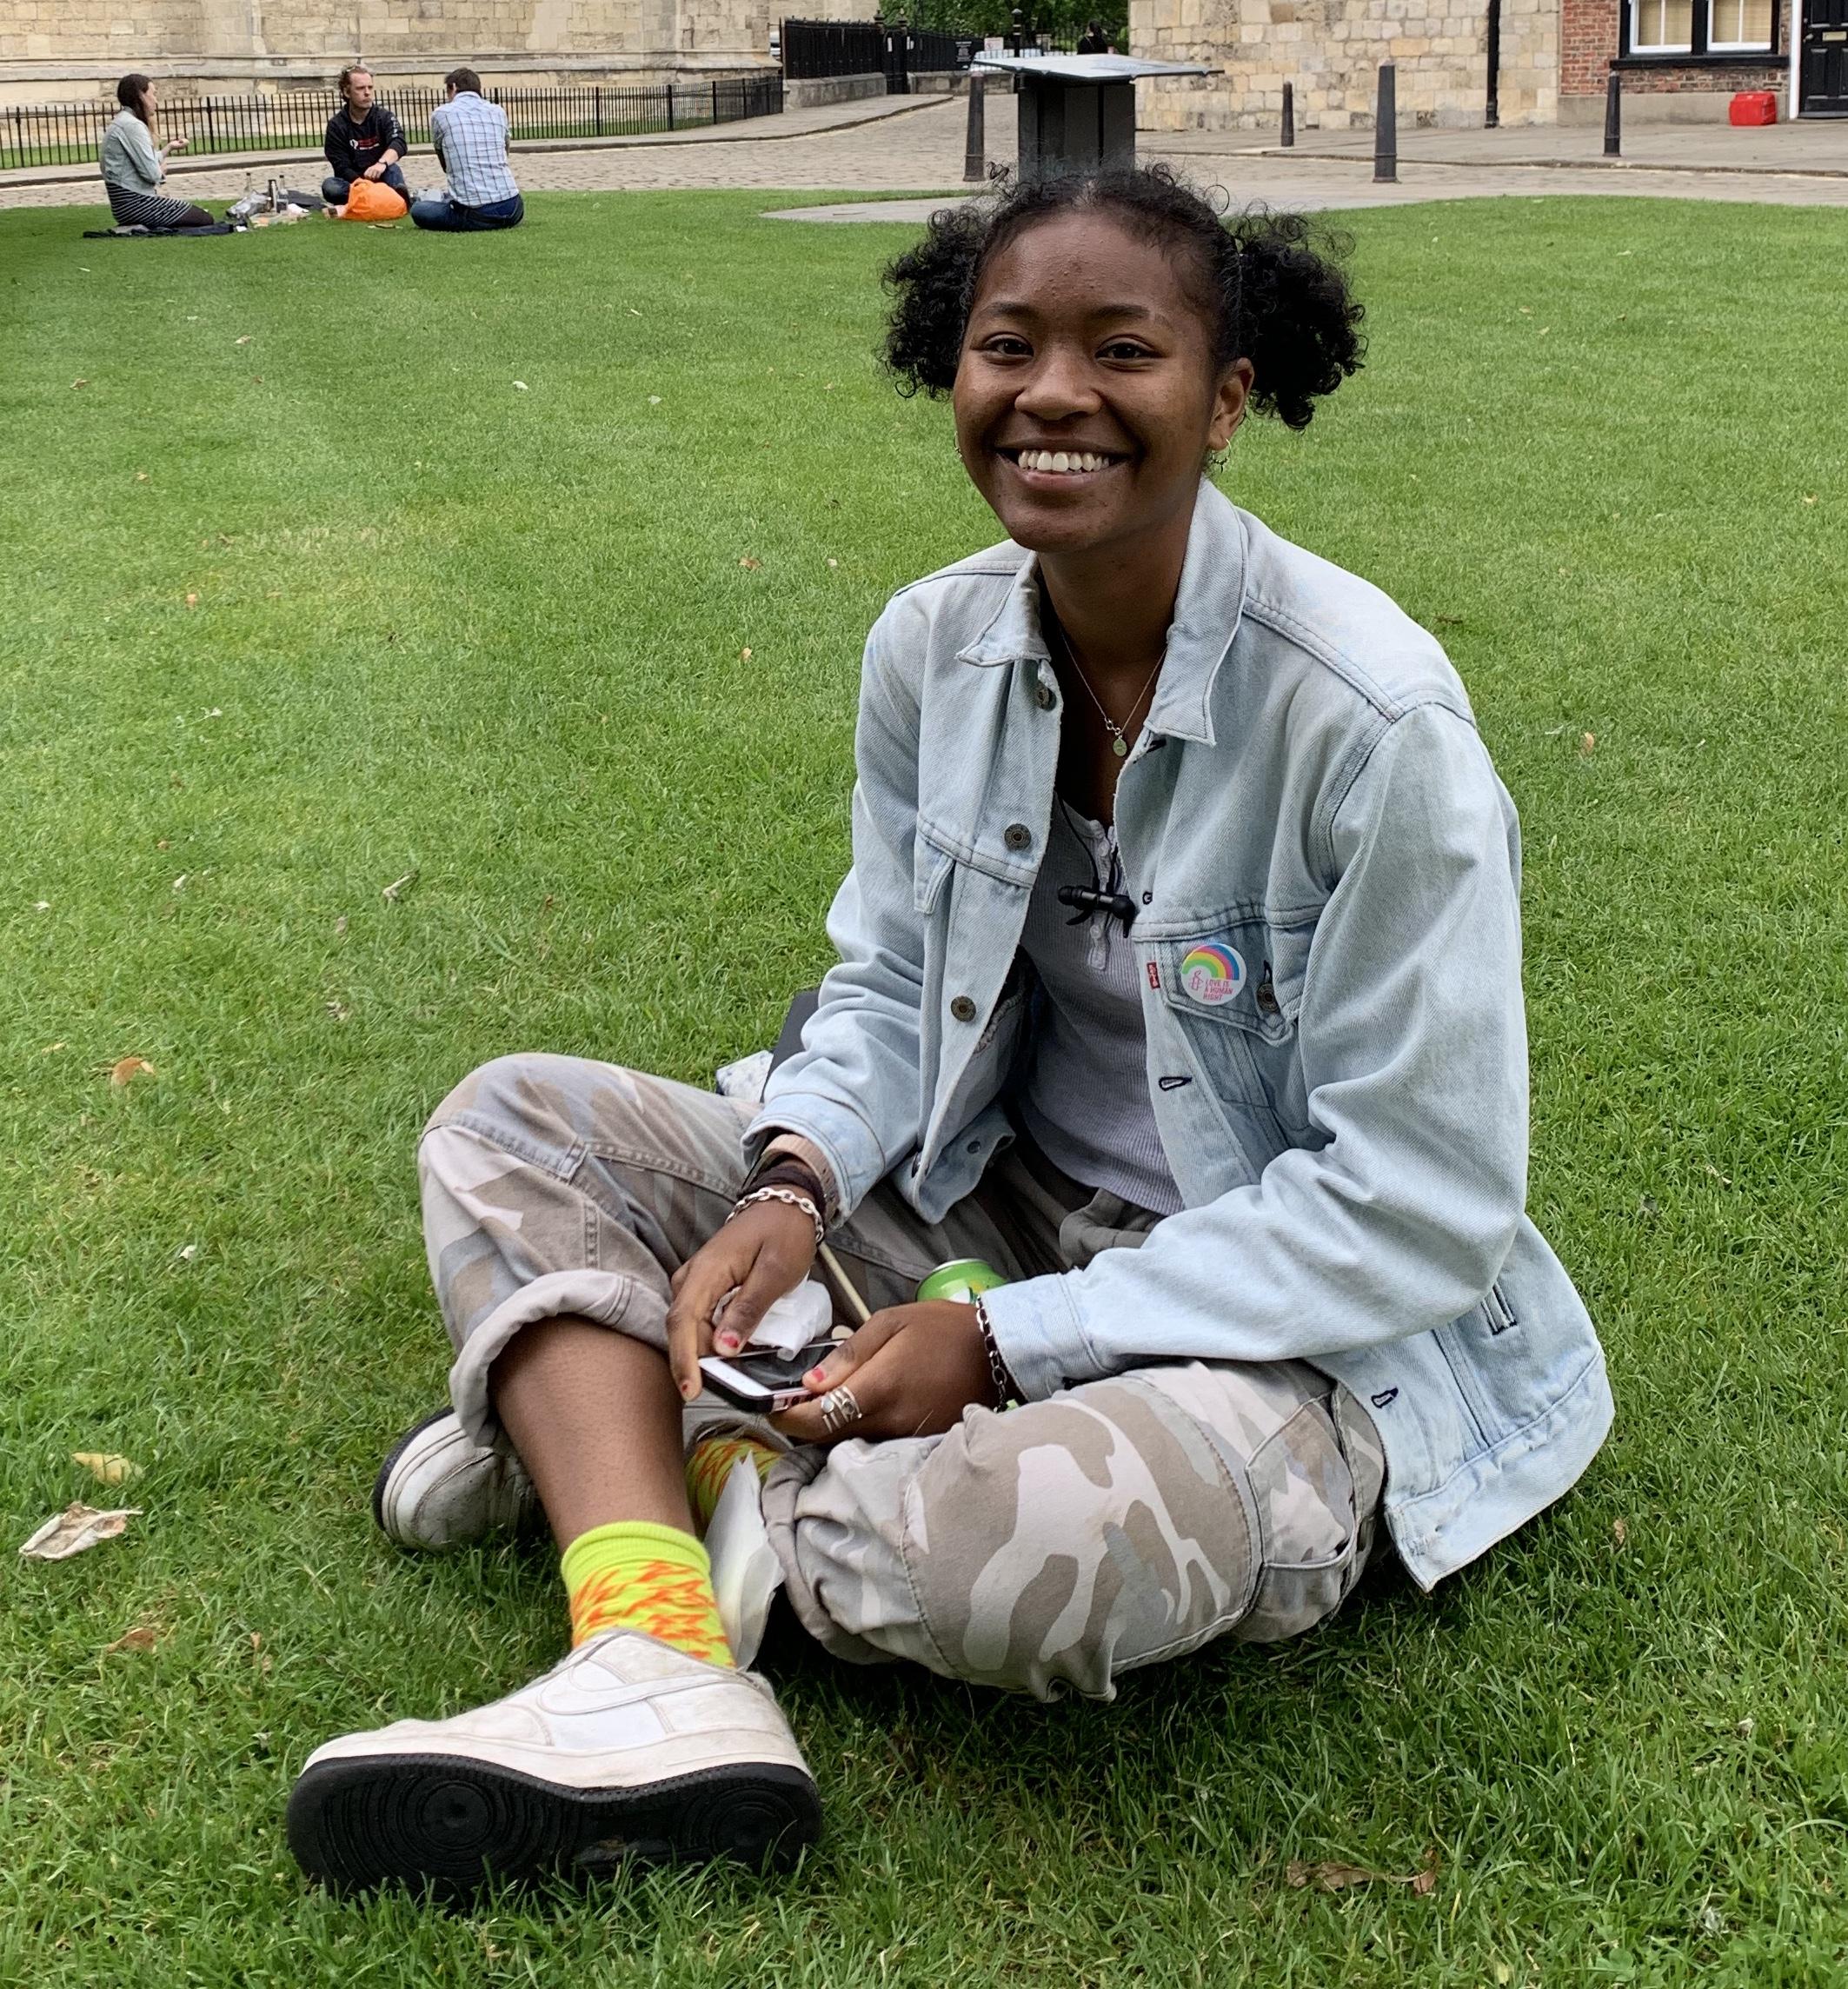 Student sat cross-legged on grass